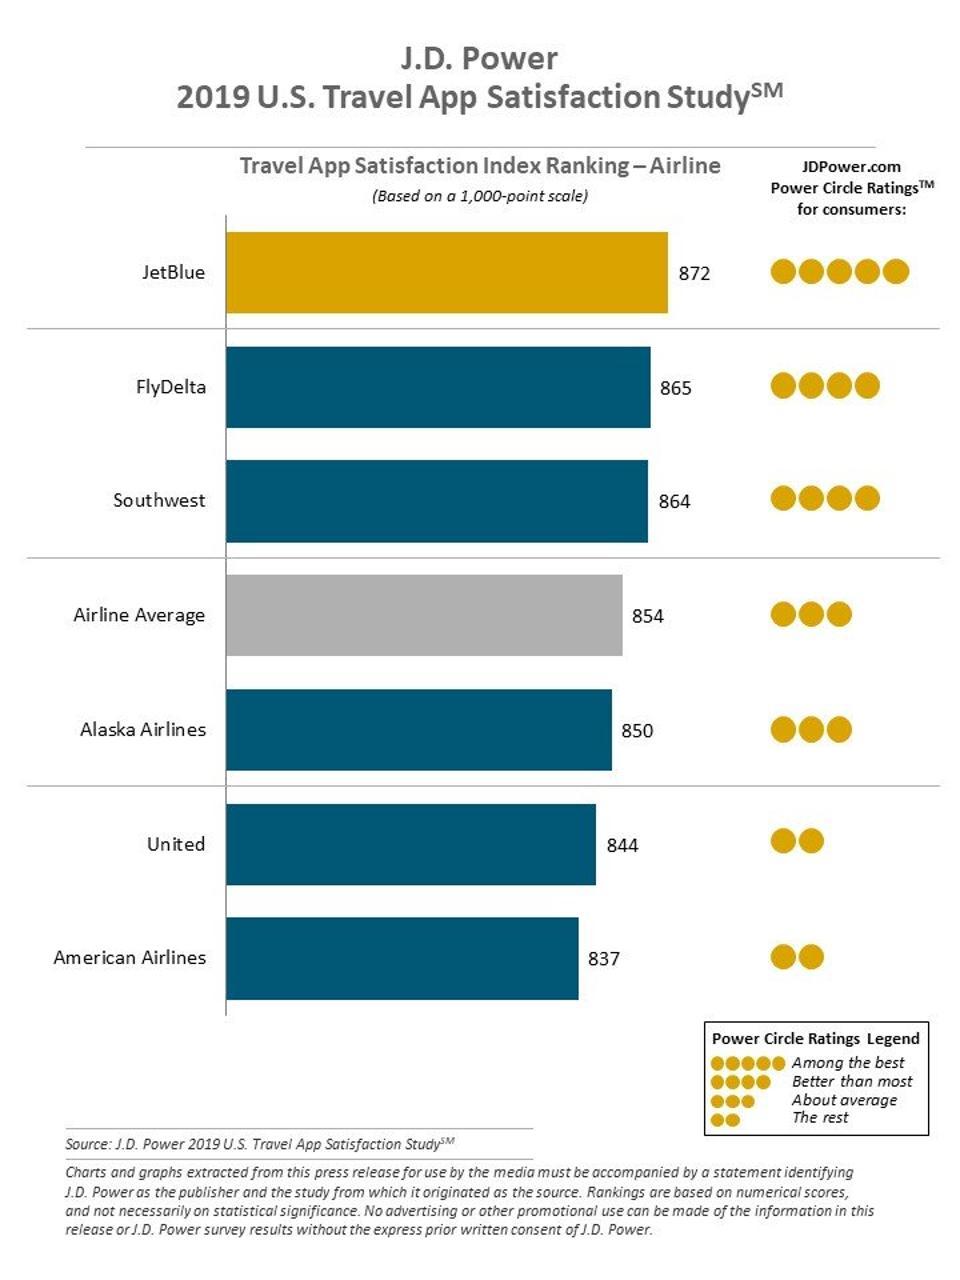 J.D. Power 2019 U.S. Travel App Satisfaction Study